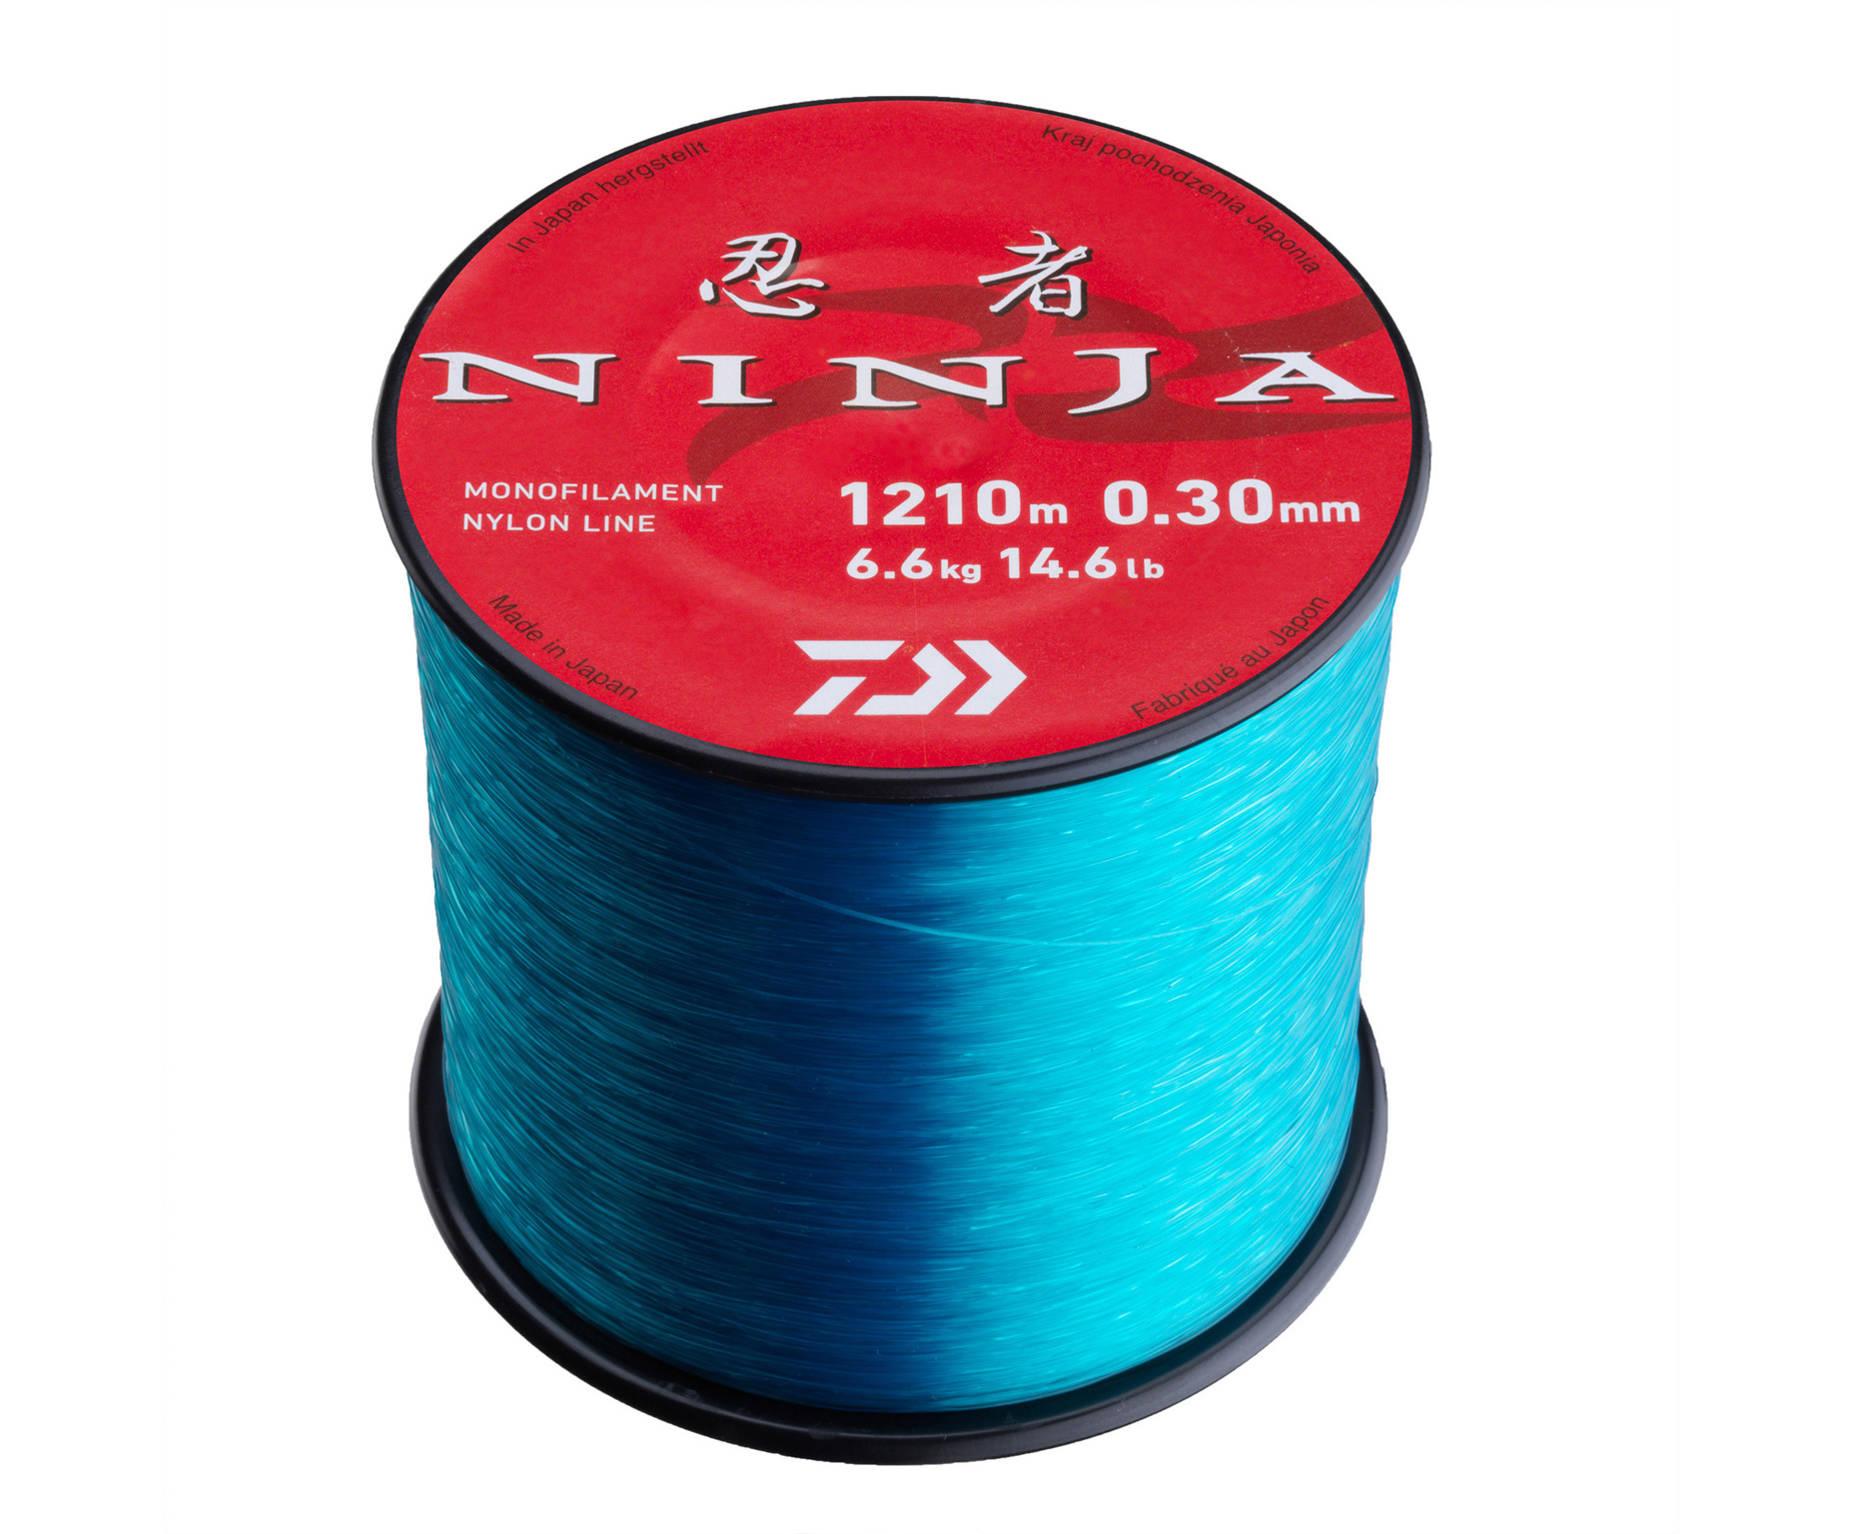 Daiwa ¯y³ka Ninja X Mono - 3700m 0.16mm 2.0kg